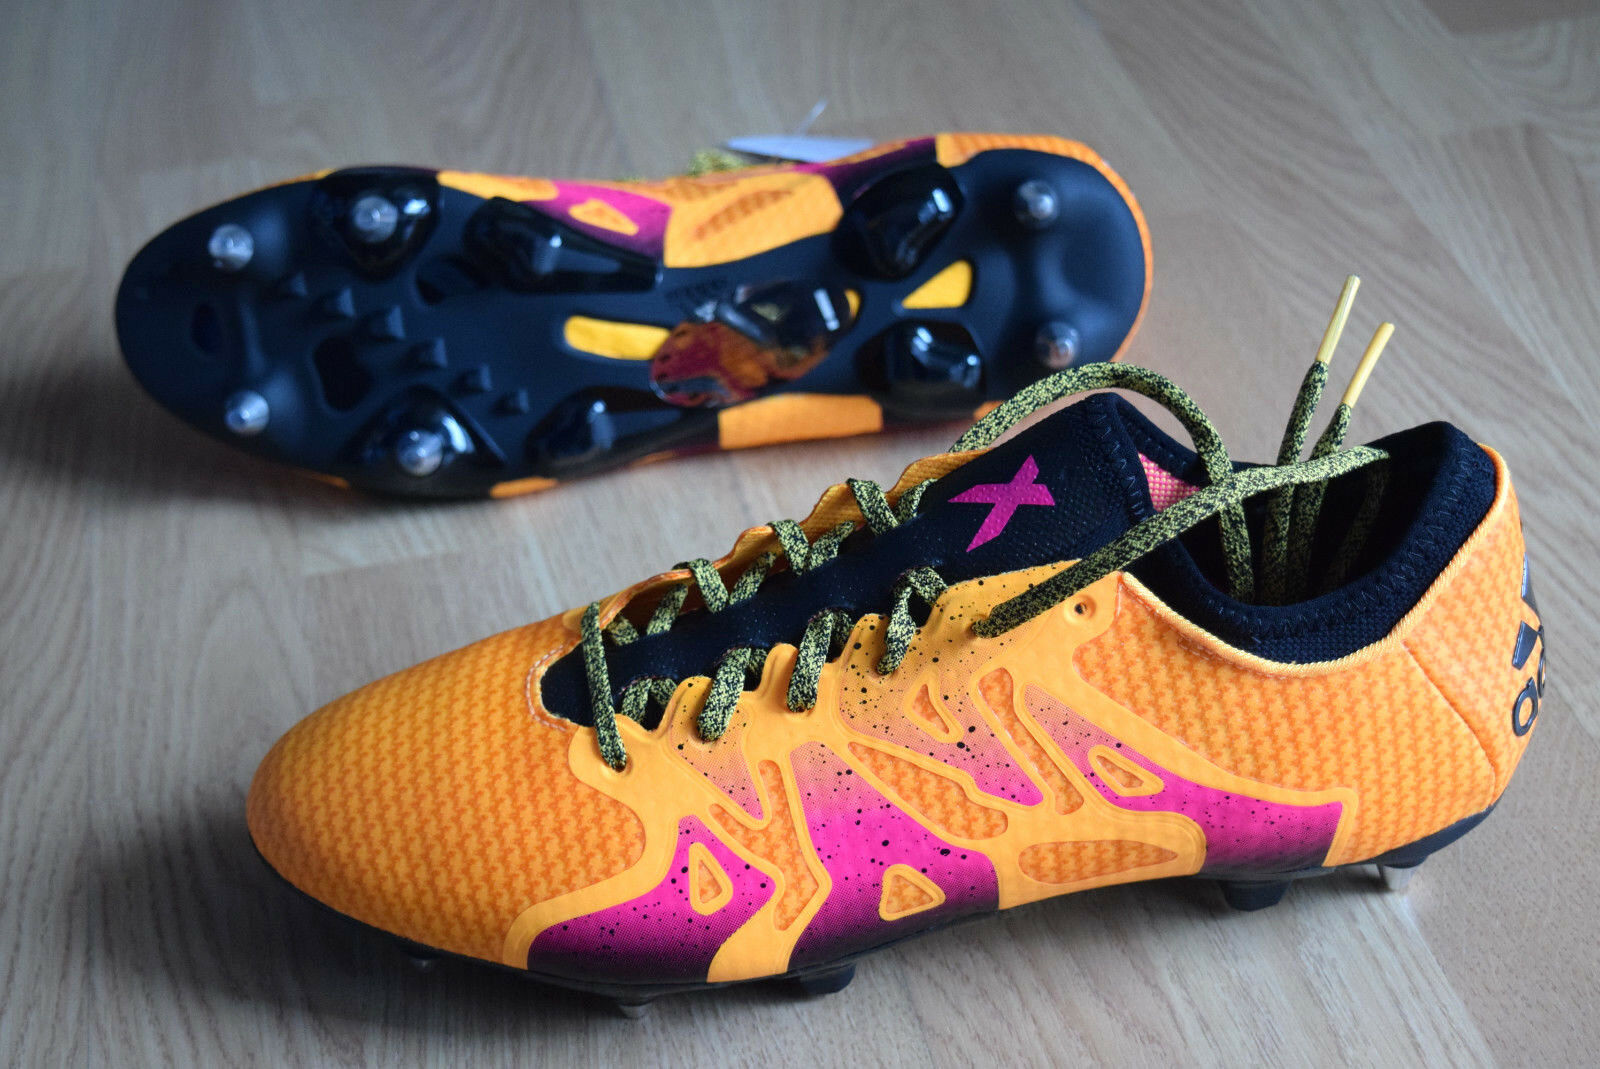 Adidas X 15 + Primeknit SG 41 48 soft Ground Premium Zapatos de fútbol aq4766